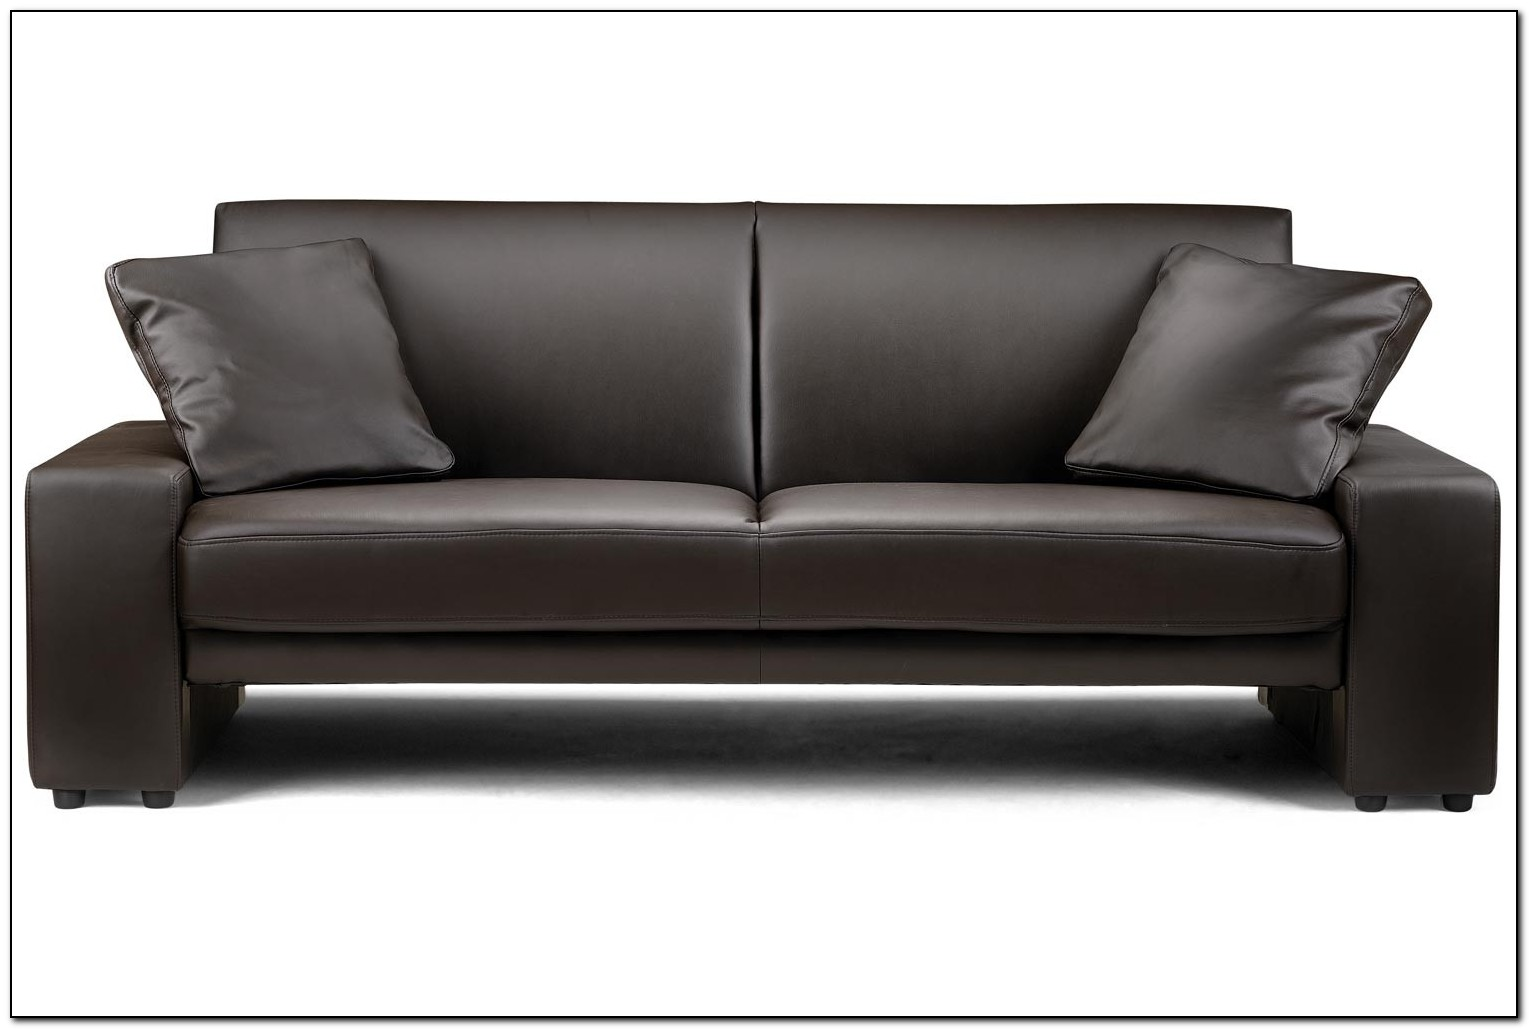 Brown Leather Sofa Living Room Design